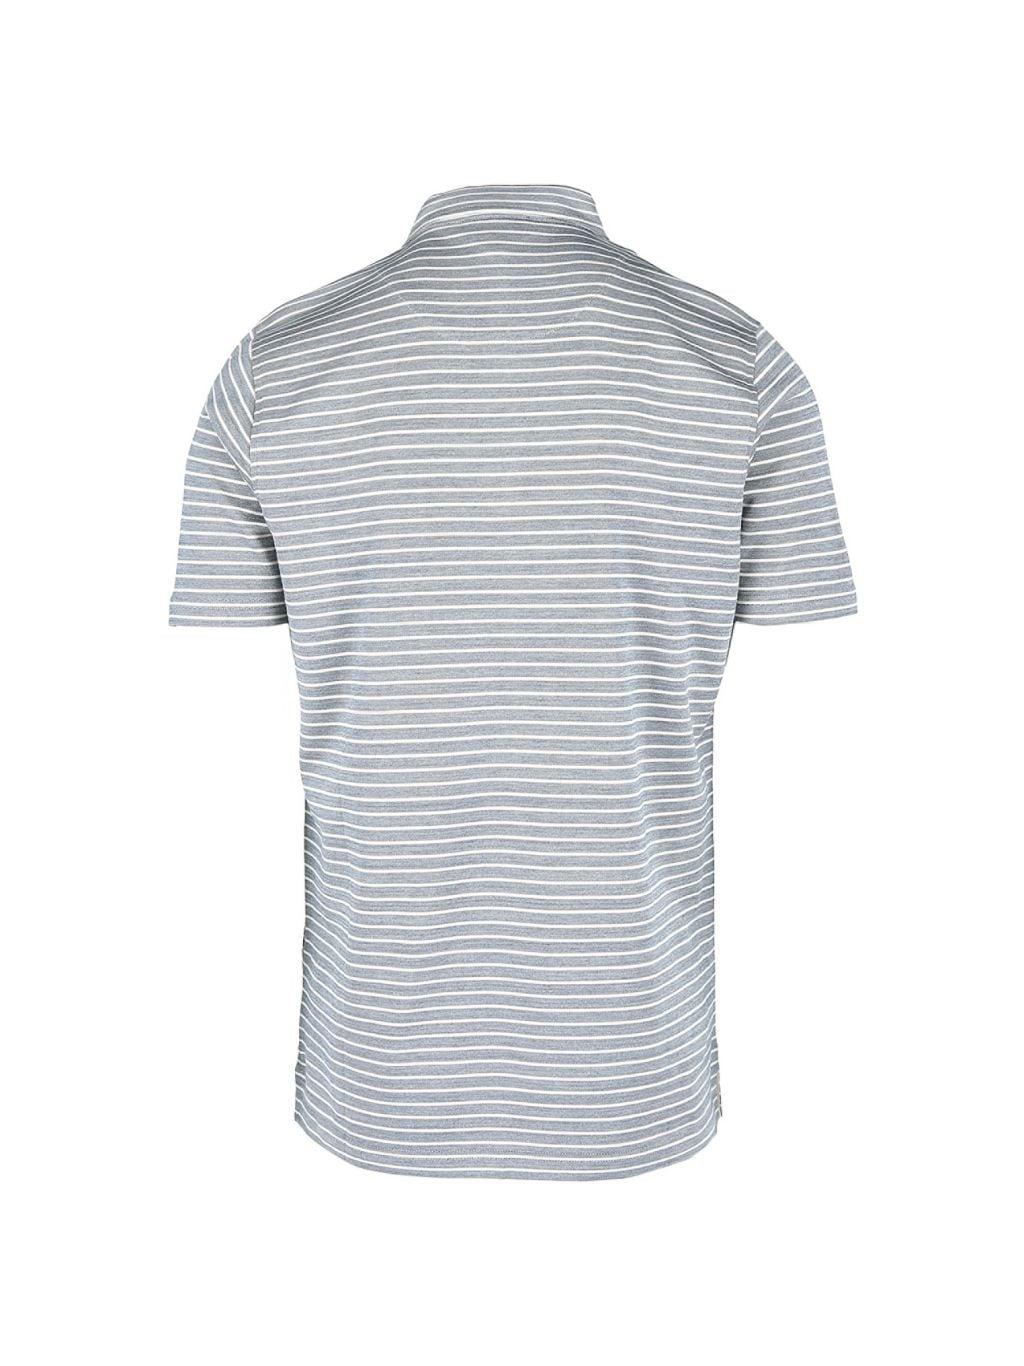 Dunhill Regular-Fit Cotton & Silk Stripe Polo